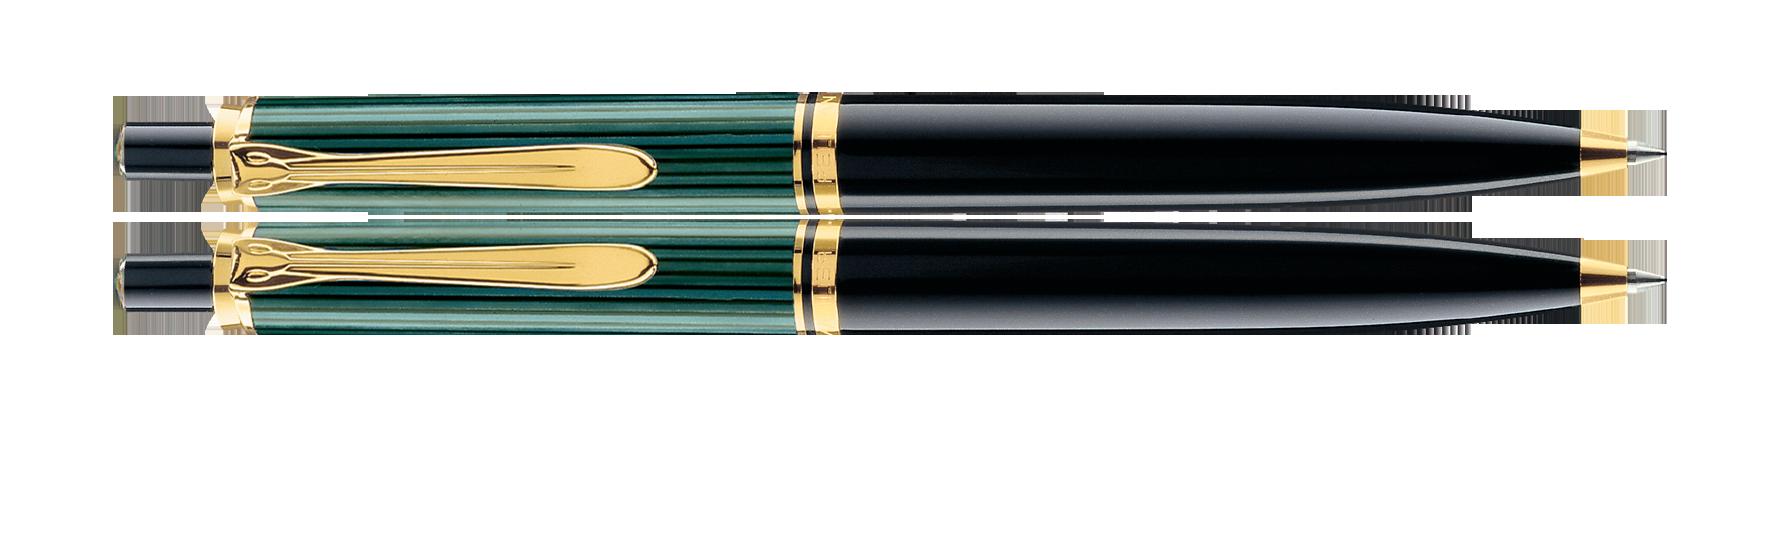 Pelikan Souverän K400 Black/Green Ballpoint Pen